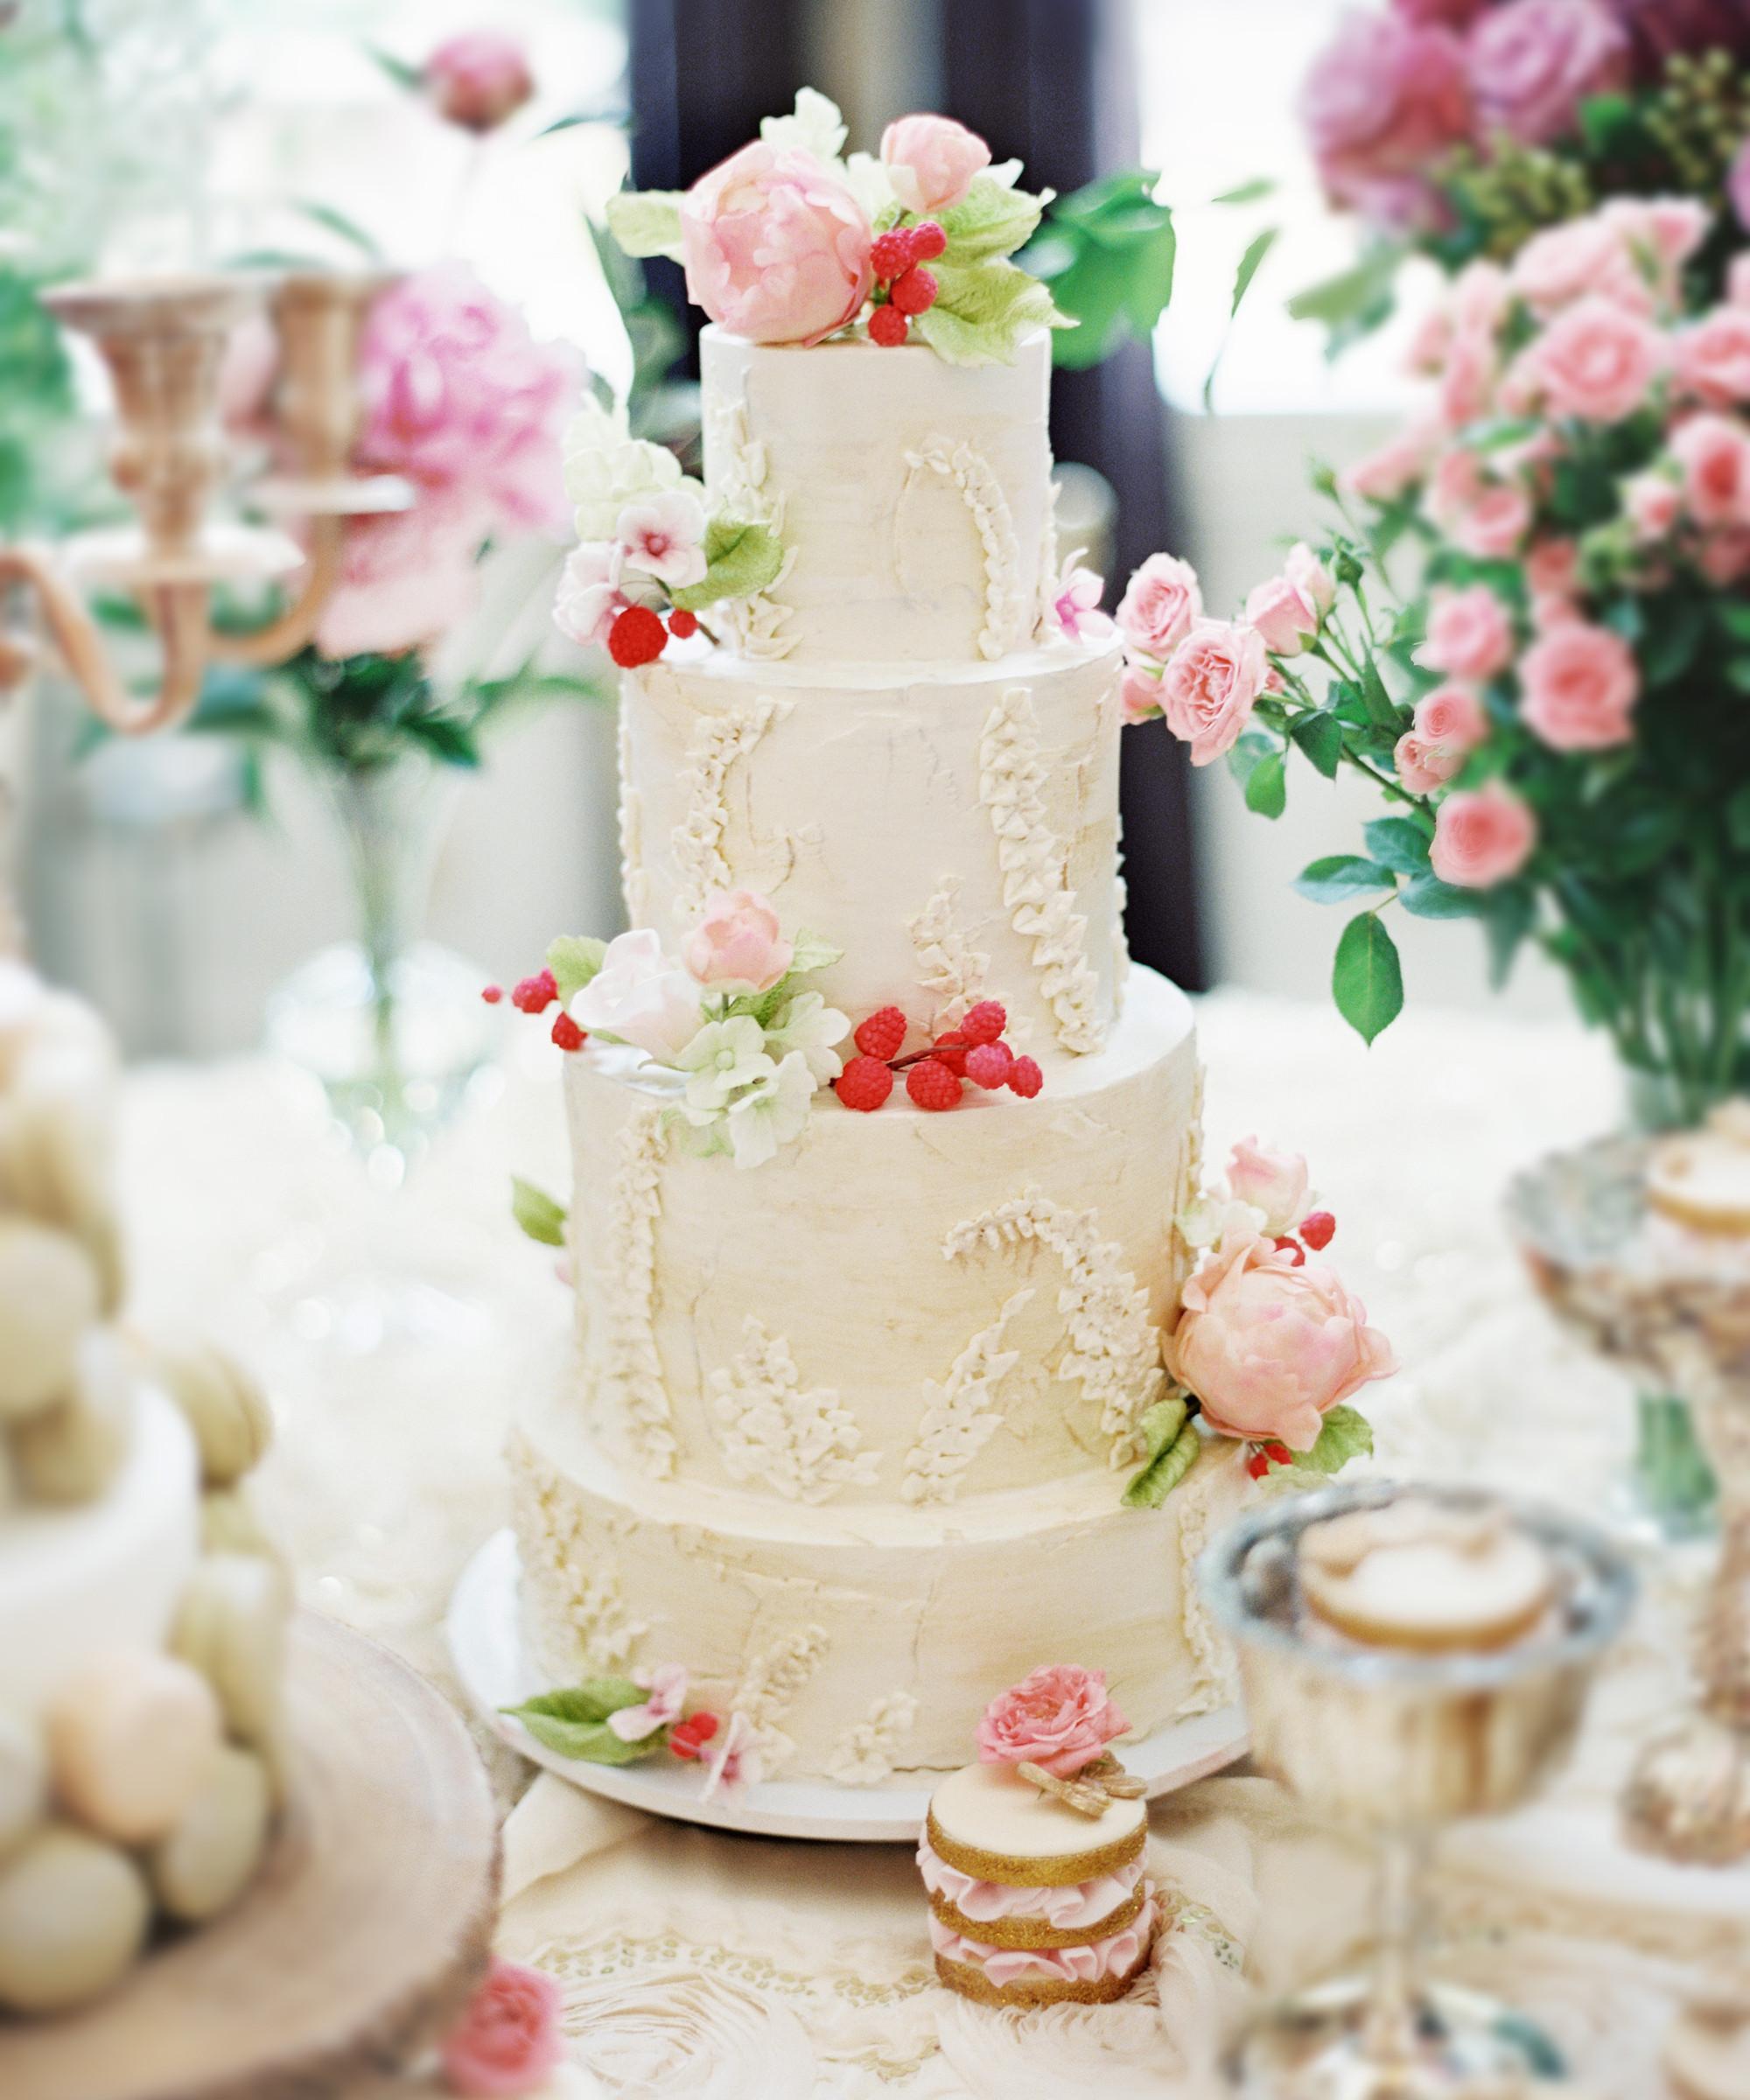 Vegan Wedding Cakes  Vegan and Gluten Free Wedding Cake Ideas Alternative